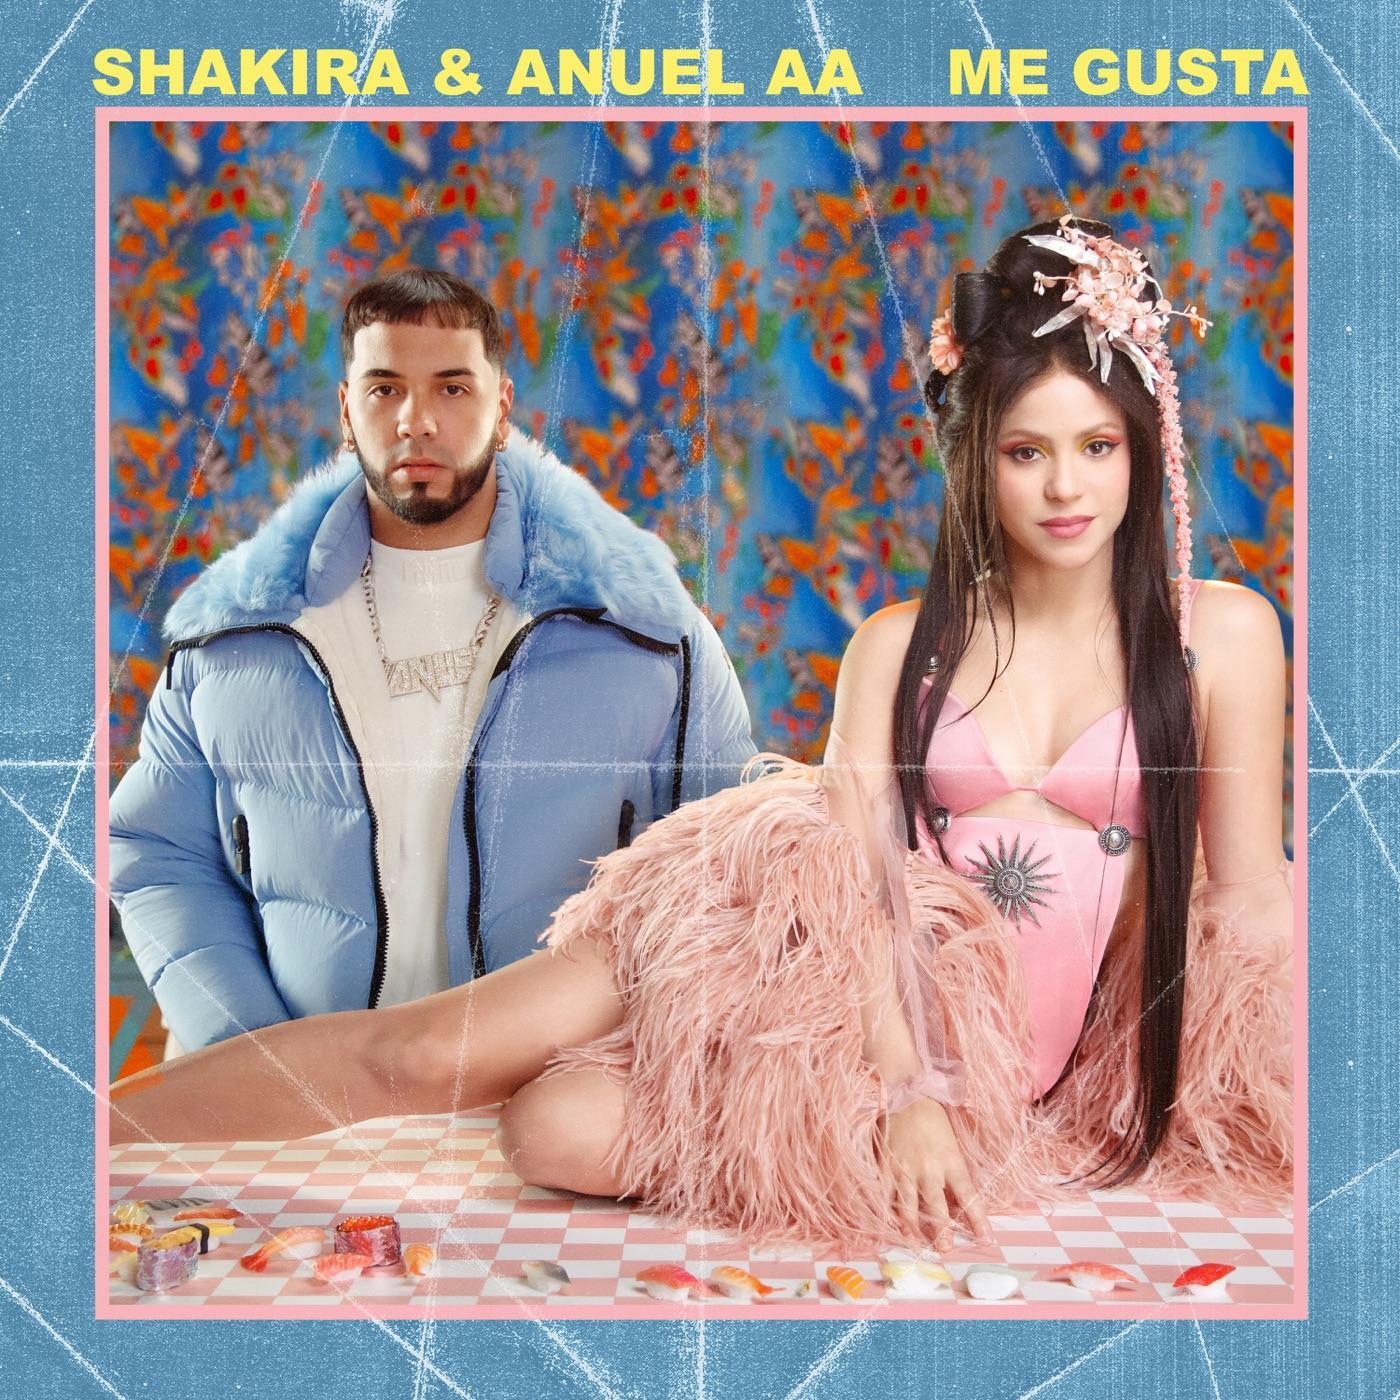 Shakira lanza ''Me gusta'' con Anuel AA a tres semanas del Super Bowl